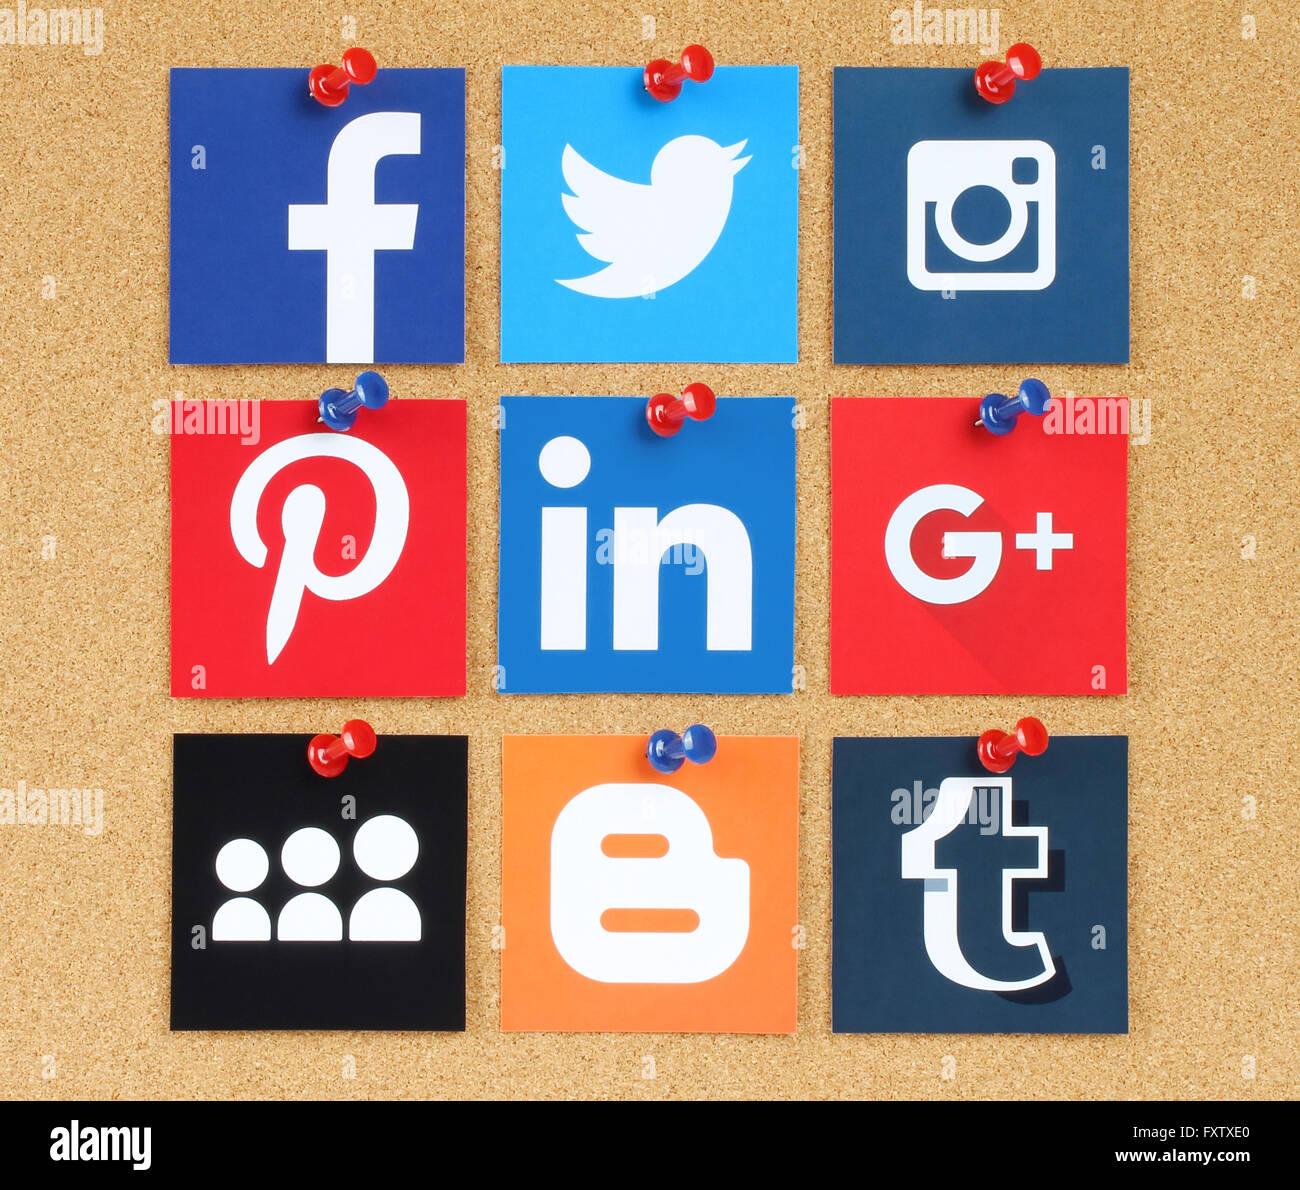 Kiev, Ukraine - March 24, 2015: Famous social media icons